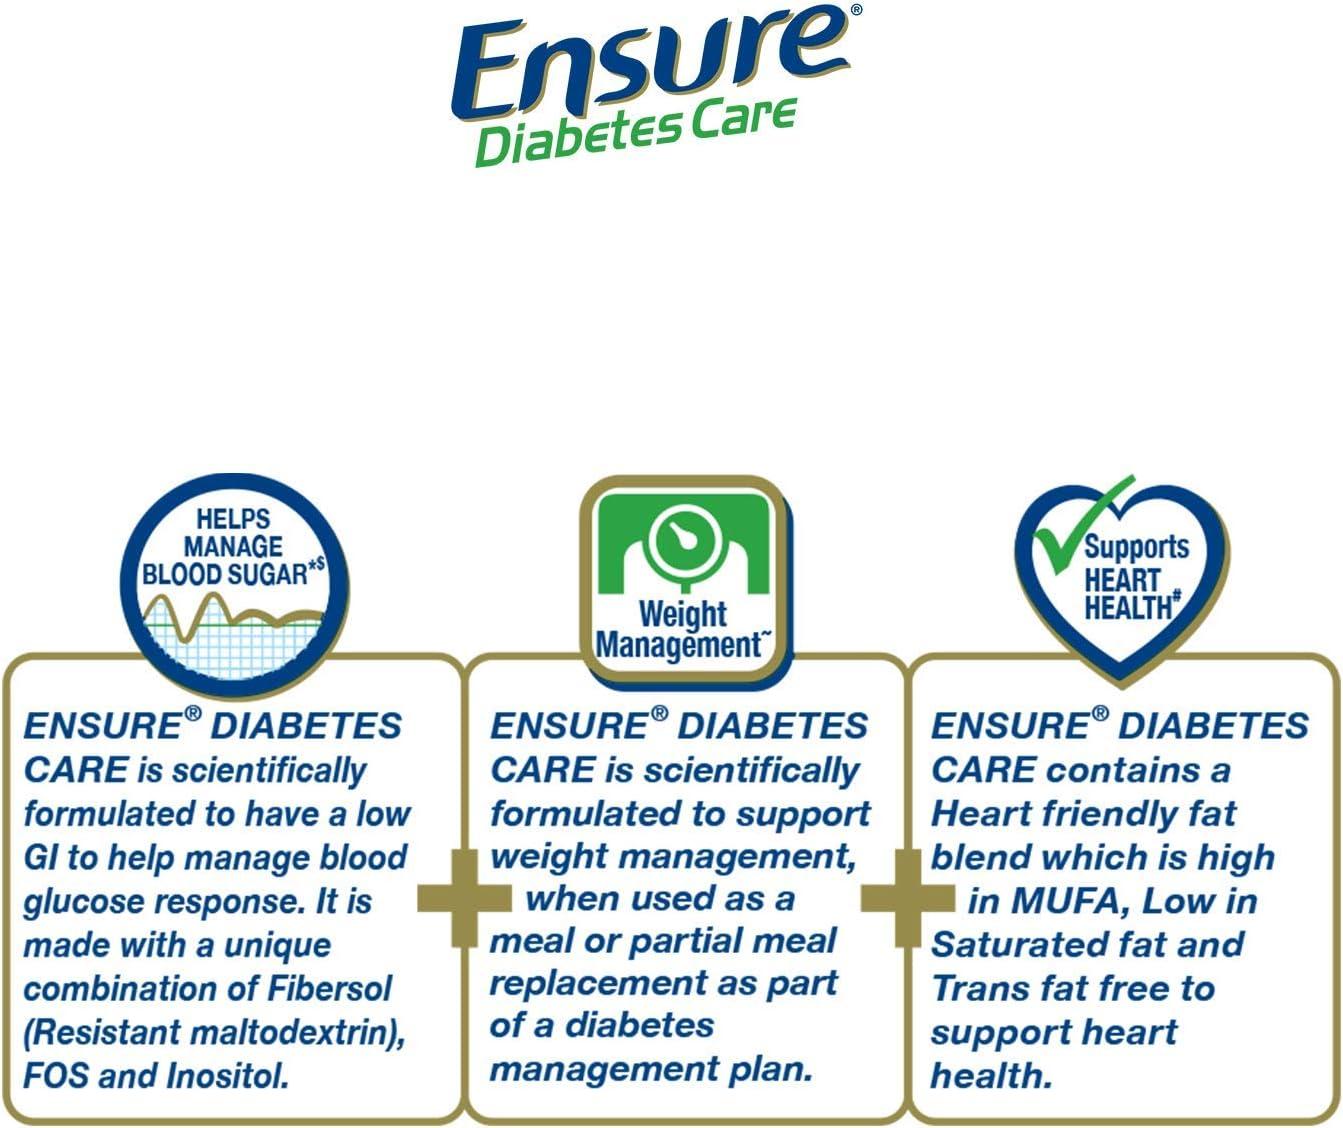 abbott diabetes care 2020